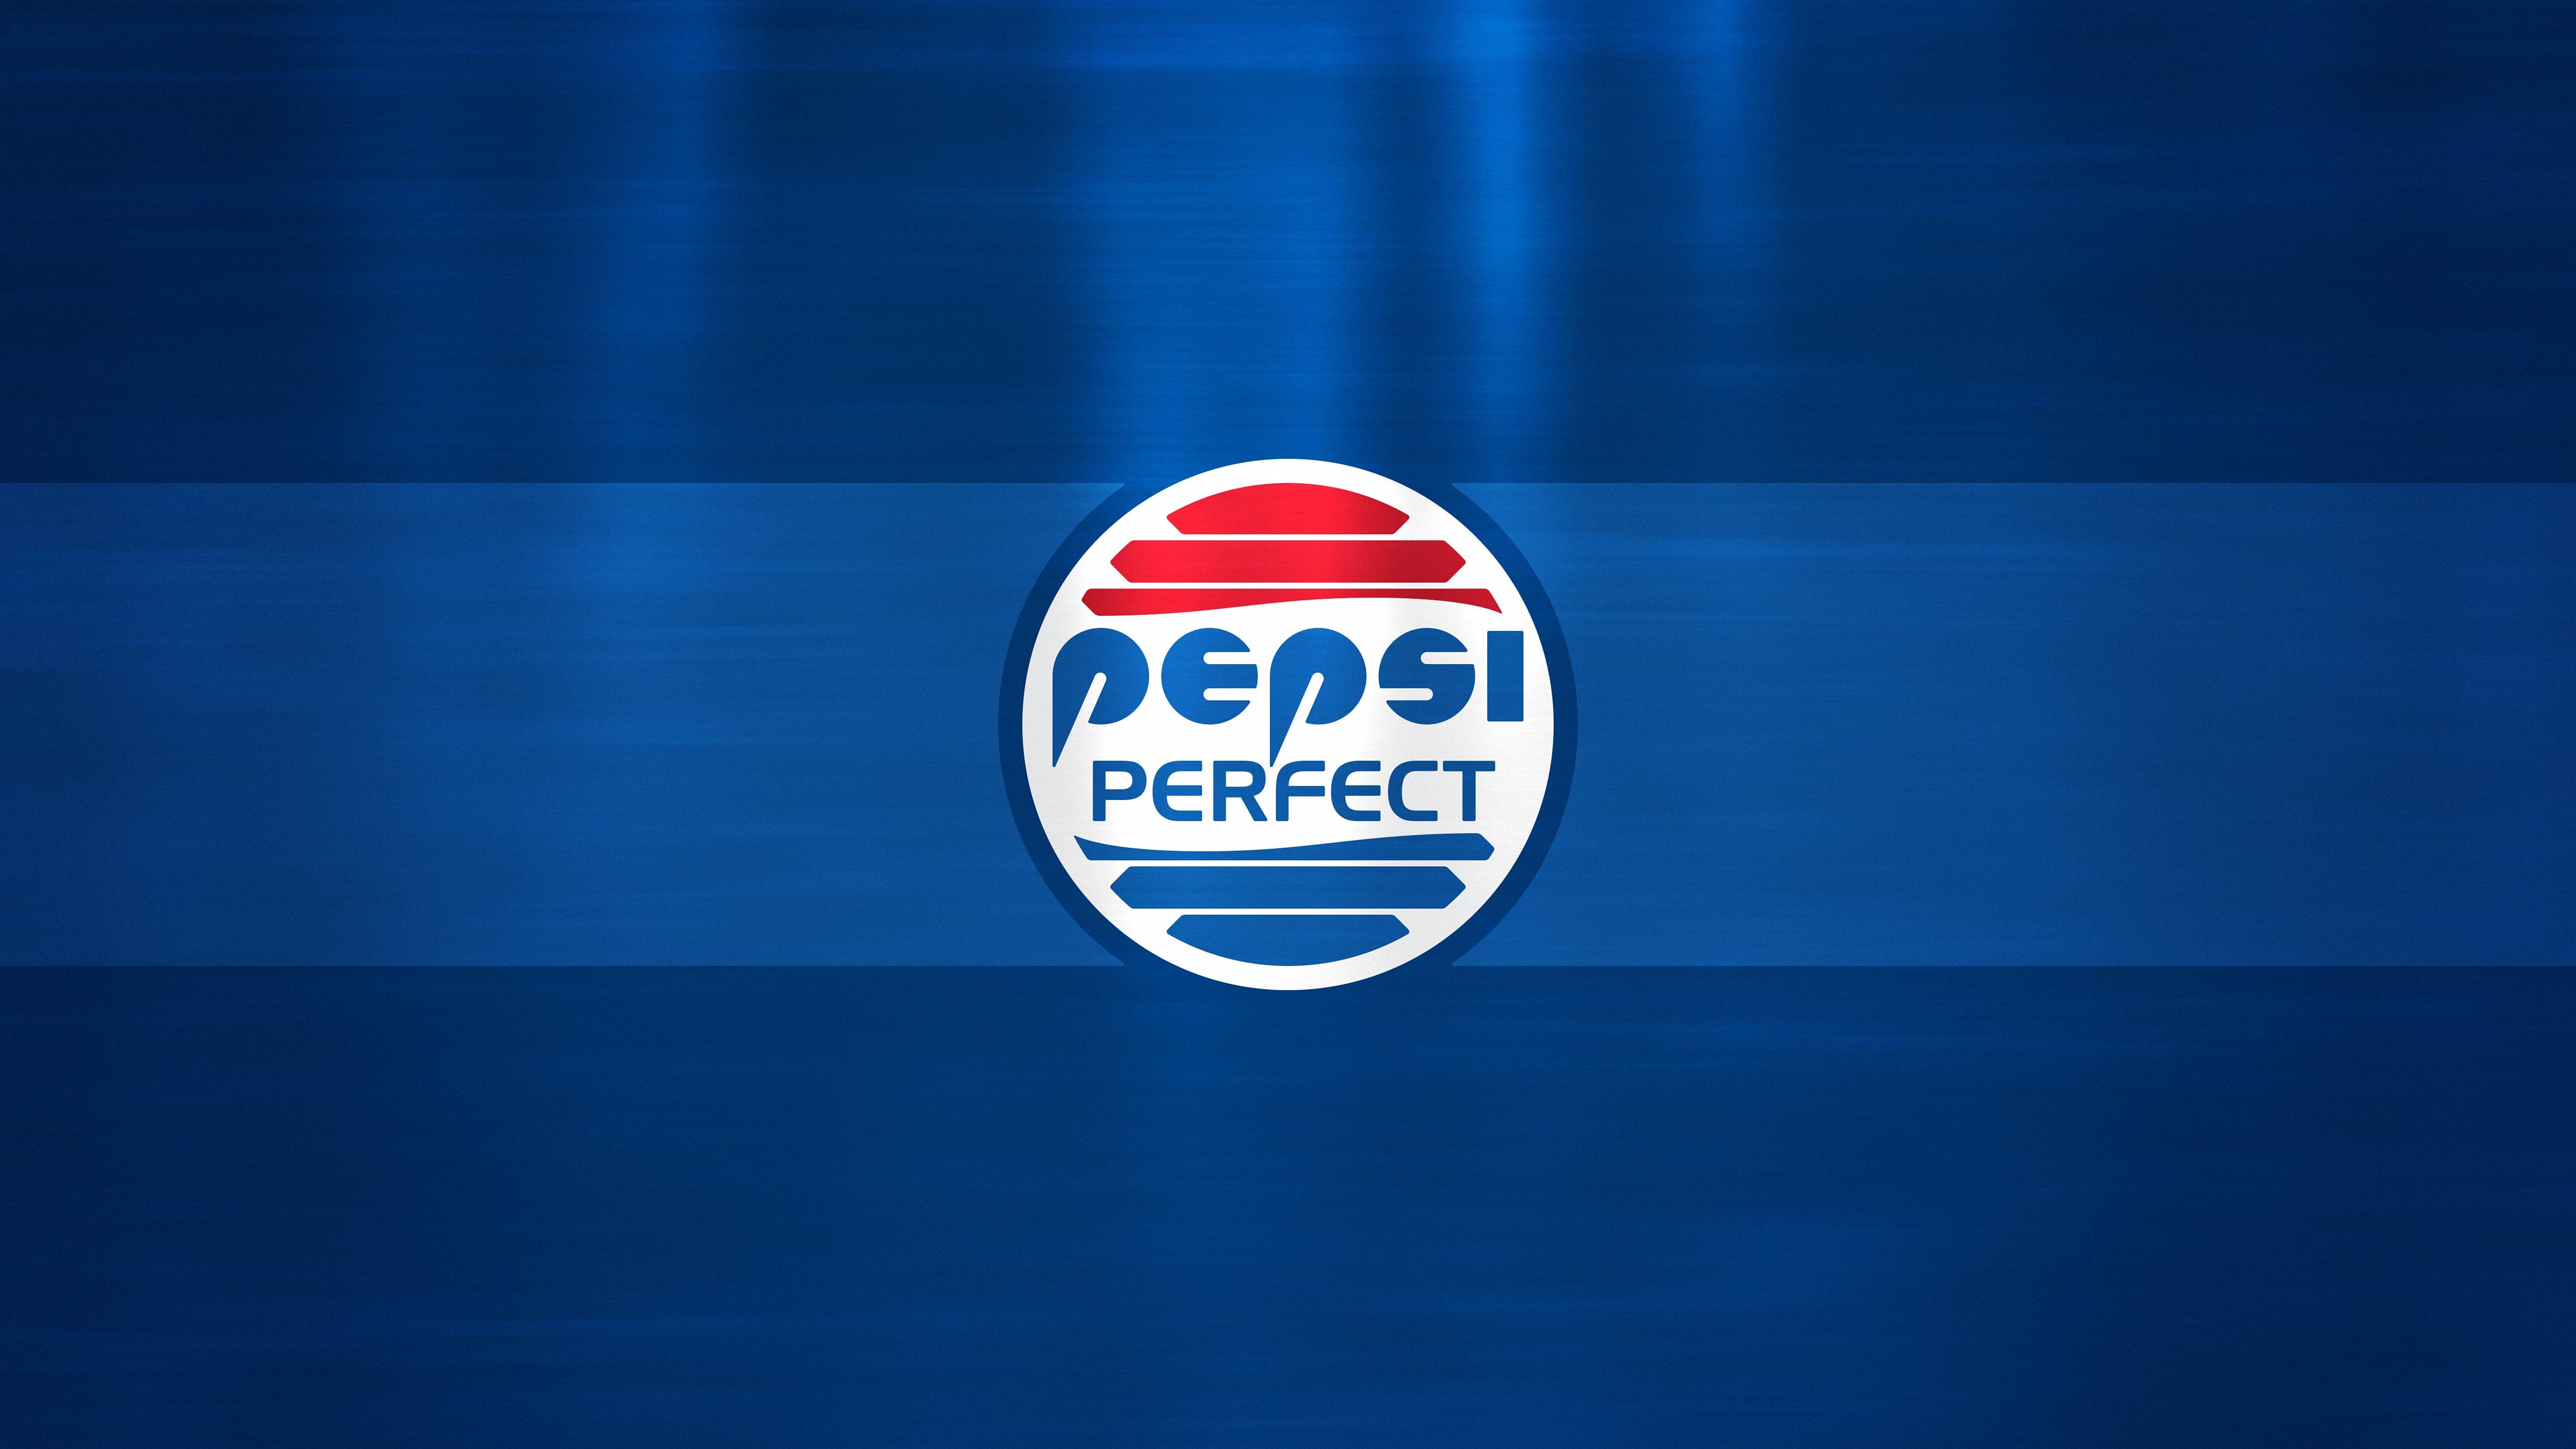 Pepsi HD Wallpapers 5120x2880